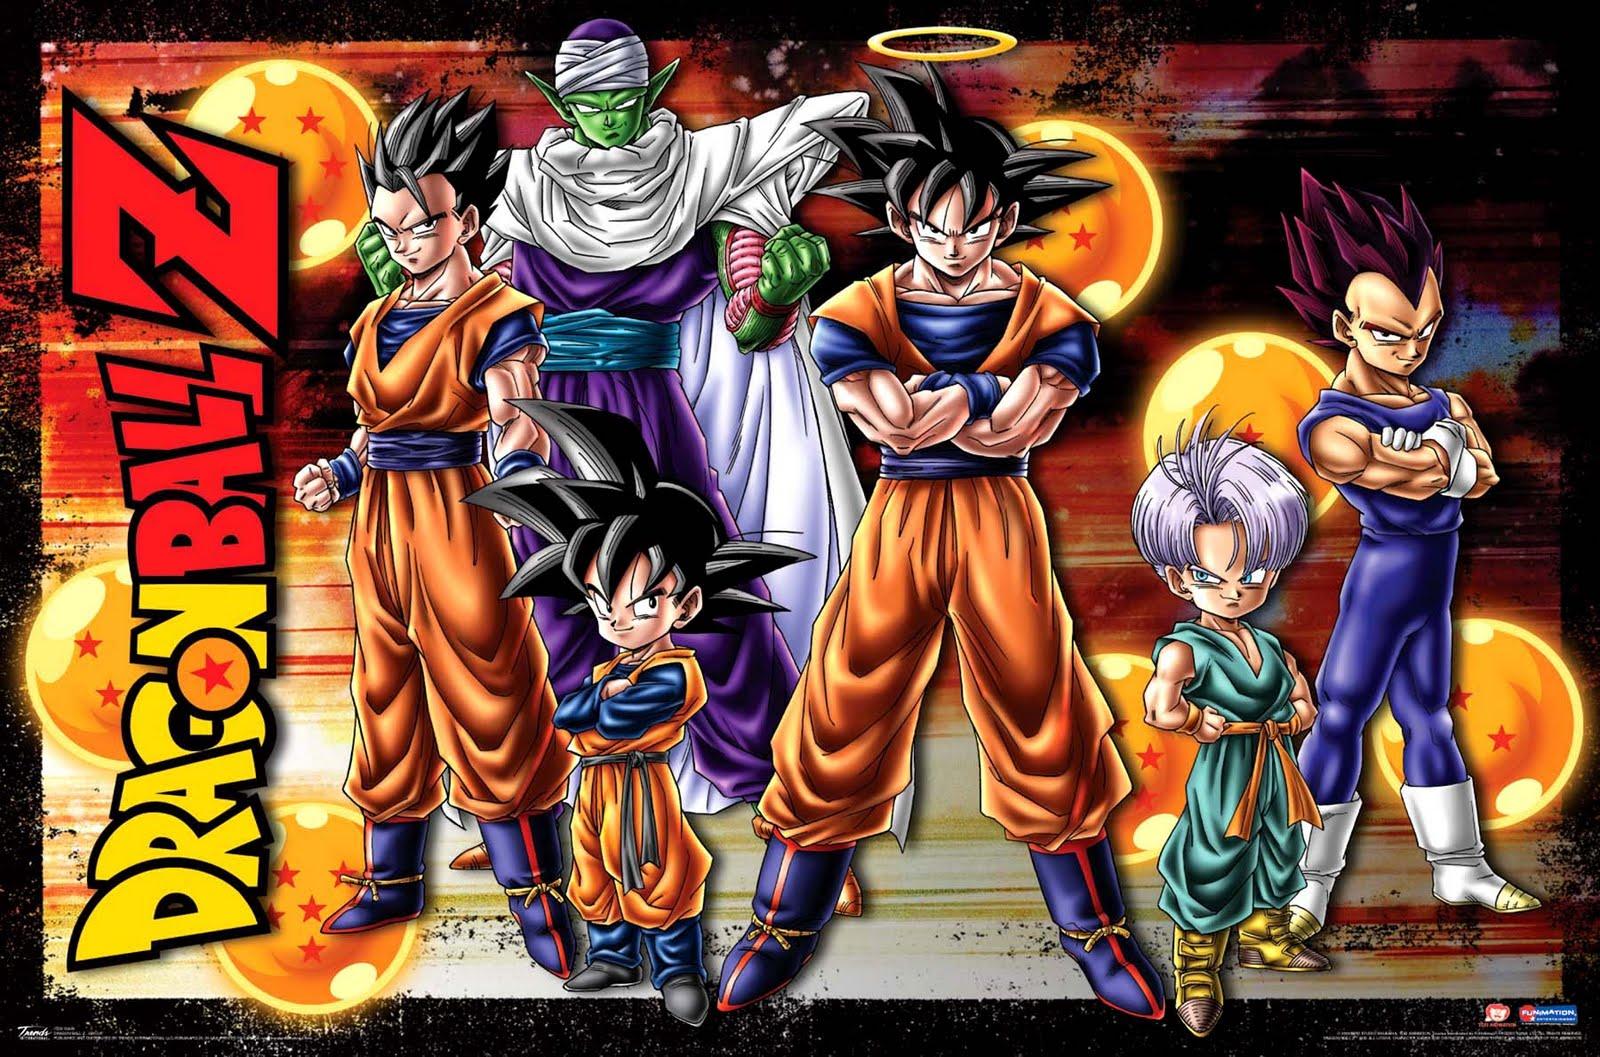 Dragon Ball Z Hd Wallpapers Page 1600x1057